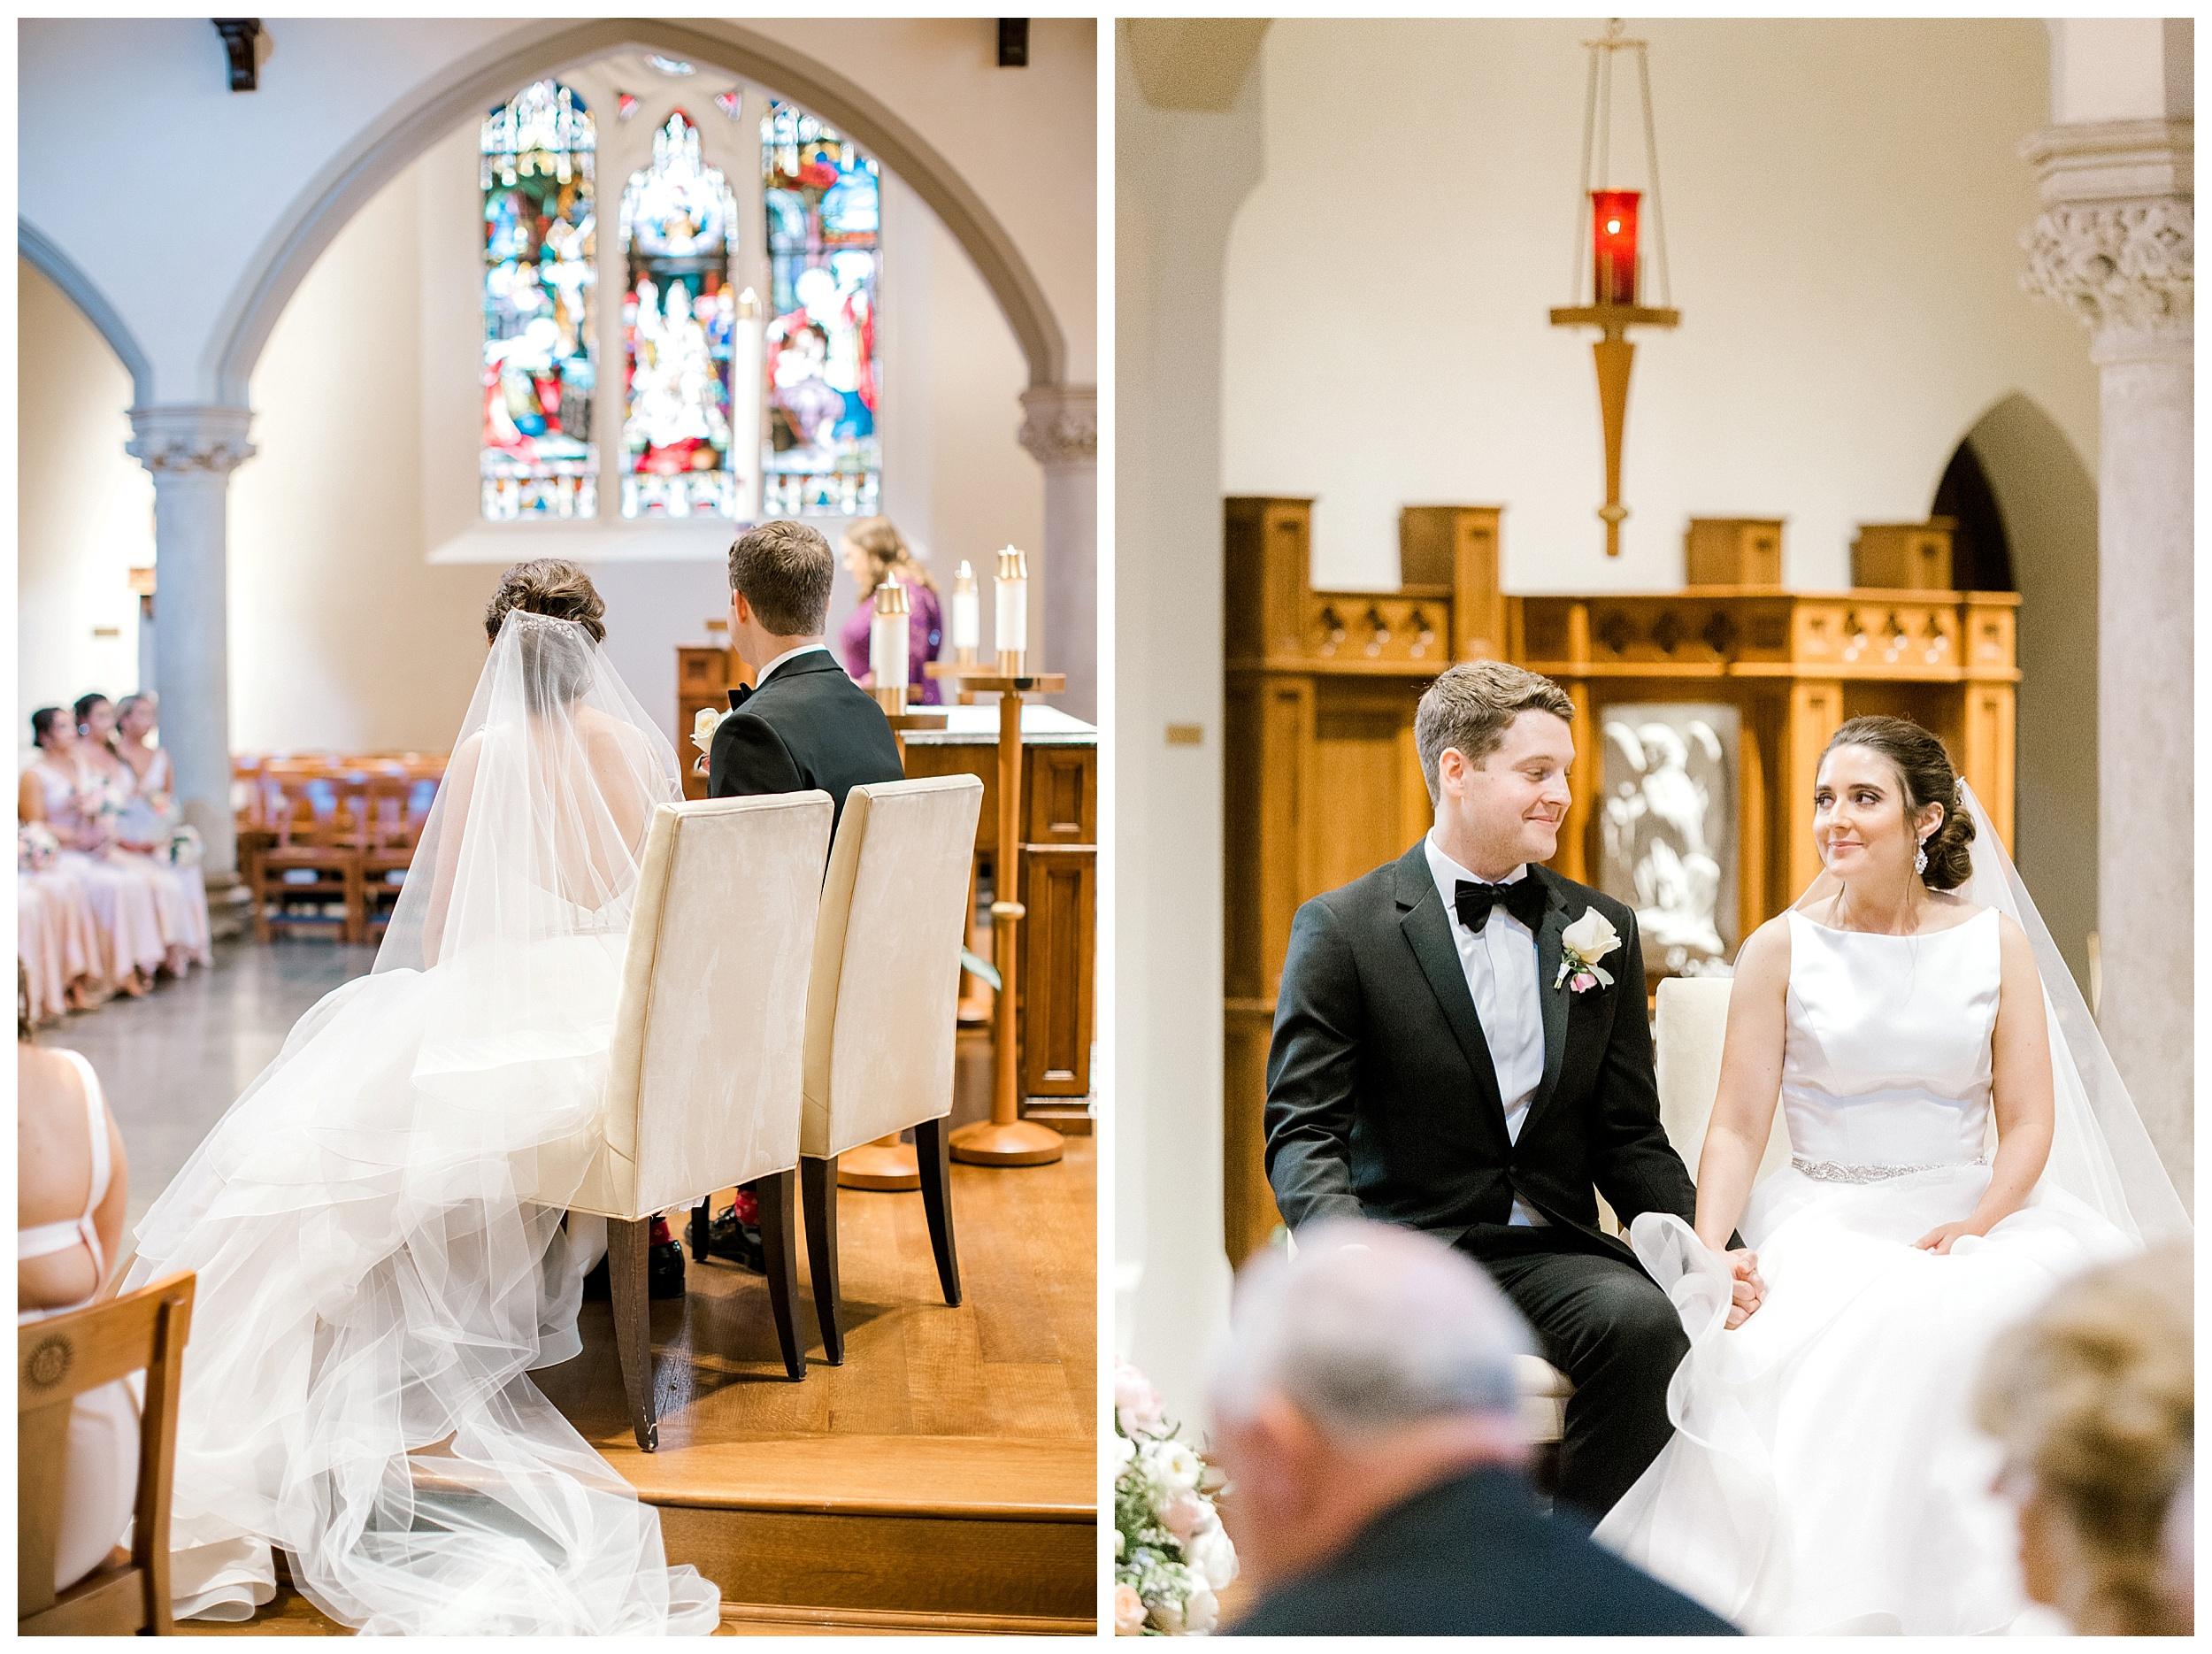 DAR Constitution Hall Wedding Wedding | Daughters of the American Revolution Wedding | District of Columbia Film Wedding Photographer Kir Tuben_0050.jpg